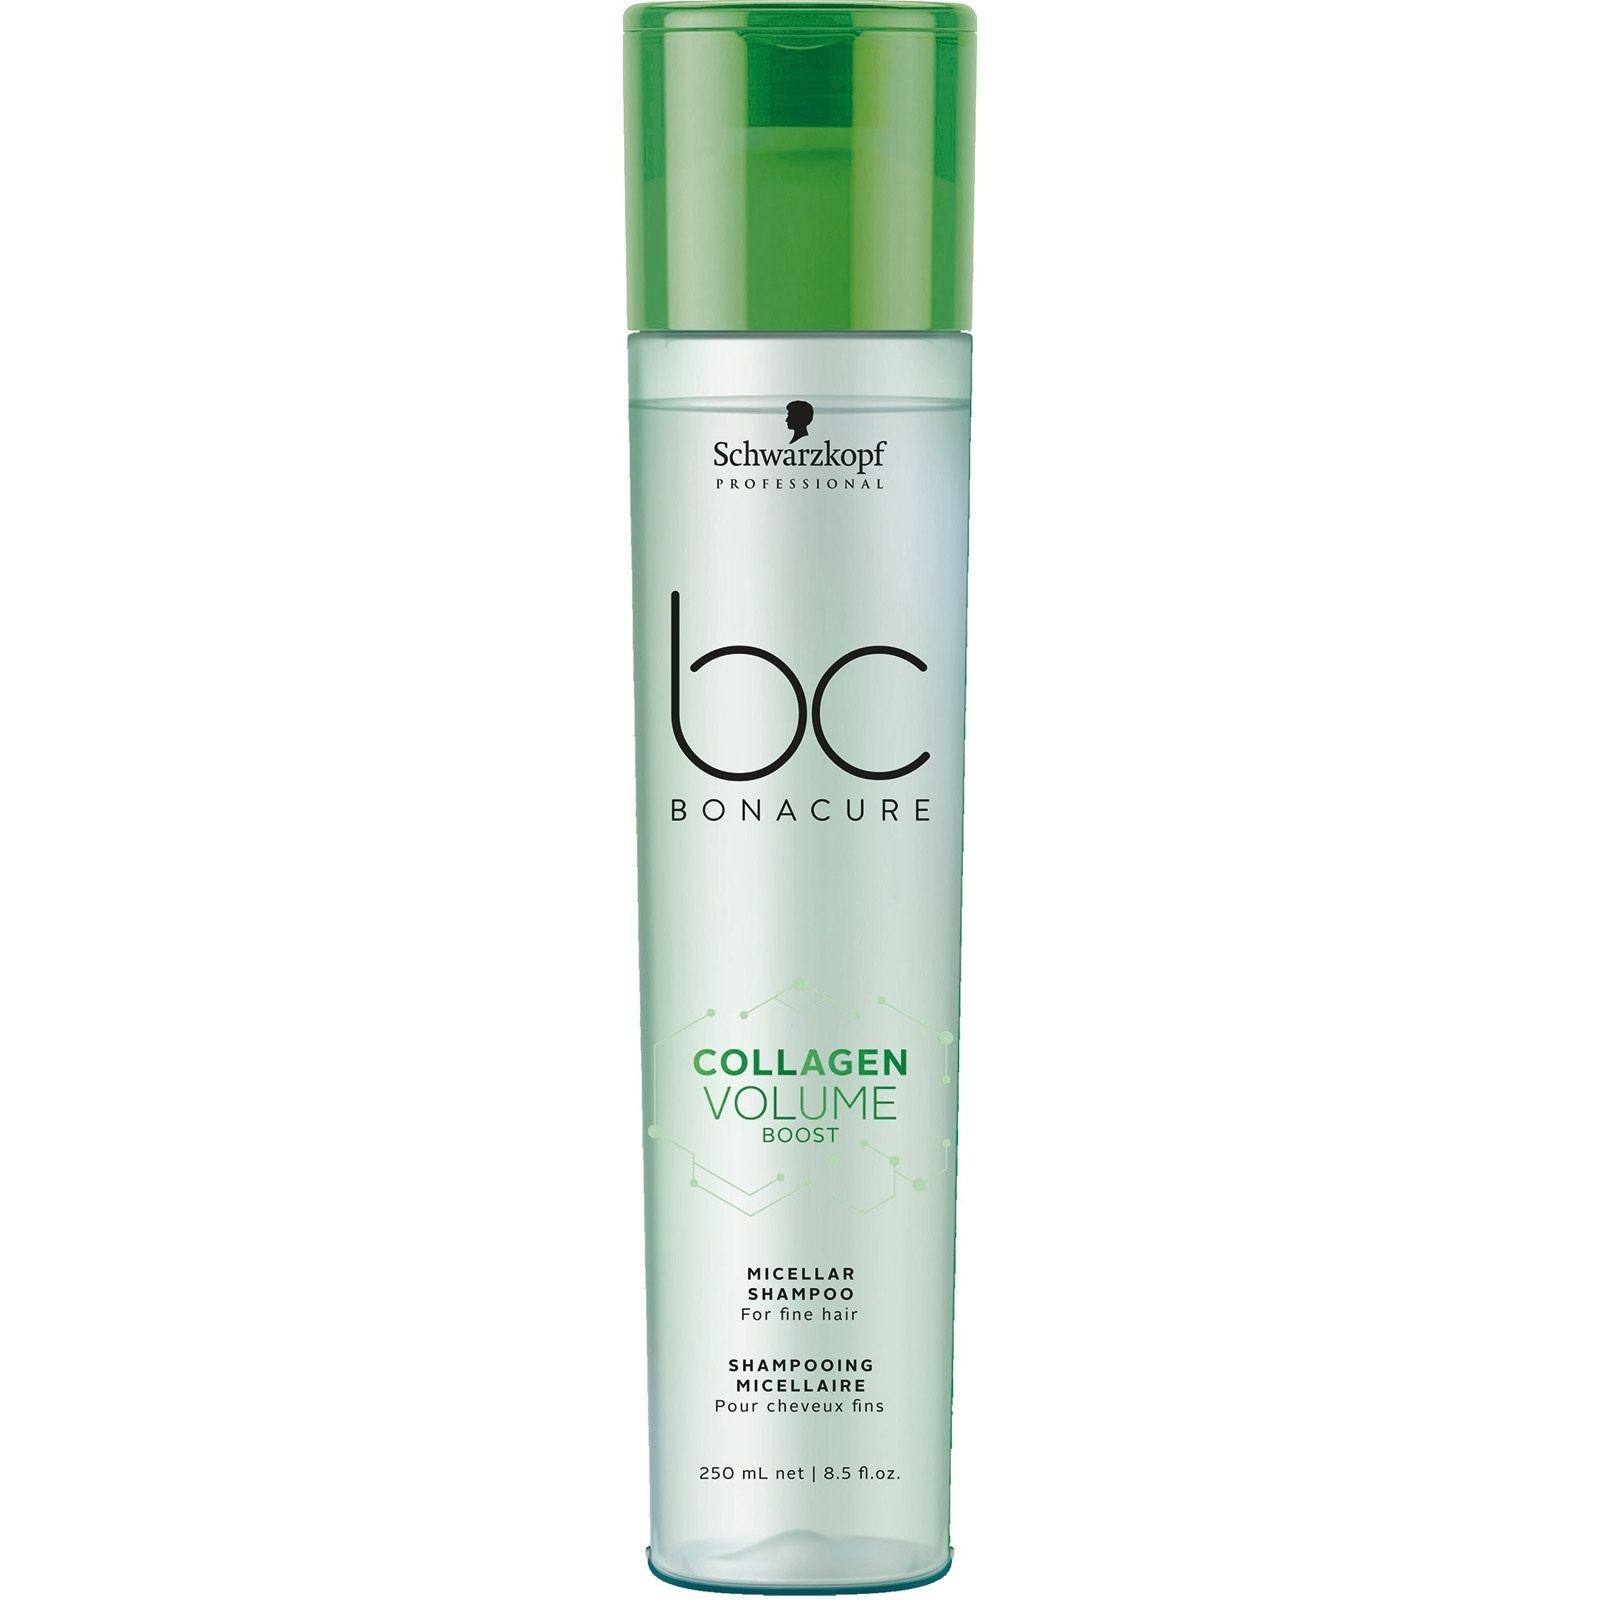 Schwarzkopf Professional Bonacure Collagen Volume Boost Micellar Shampoo 8.5oz